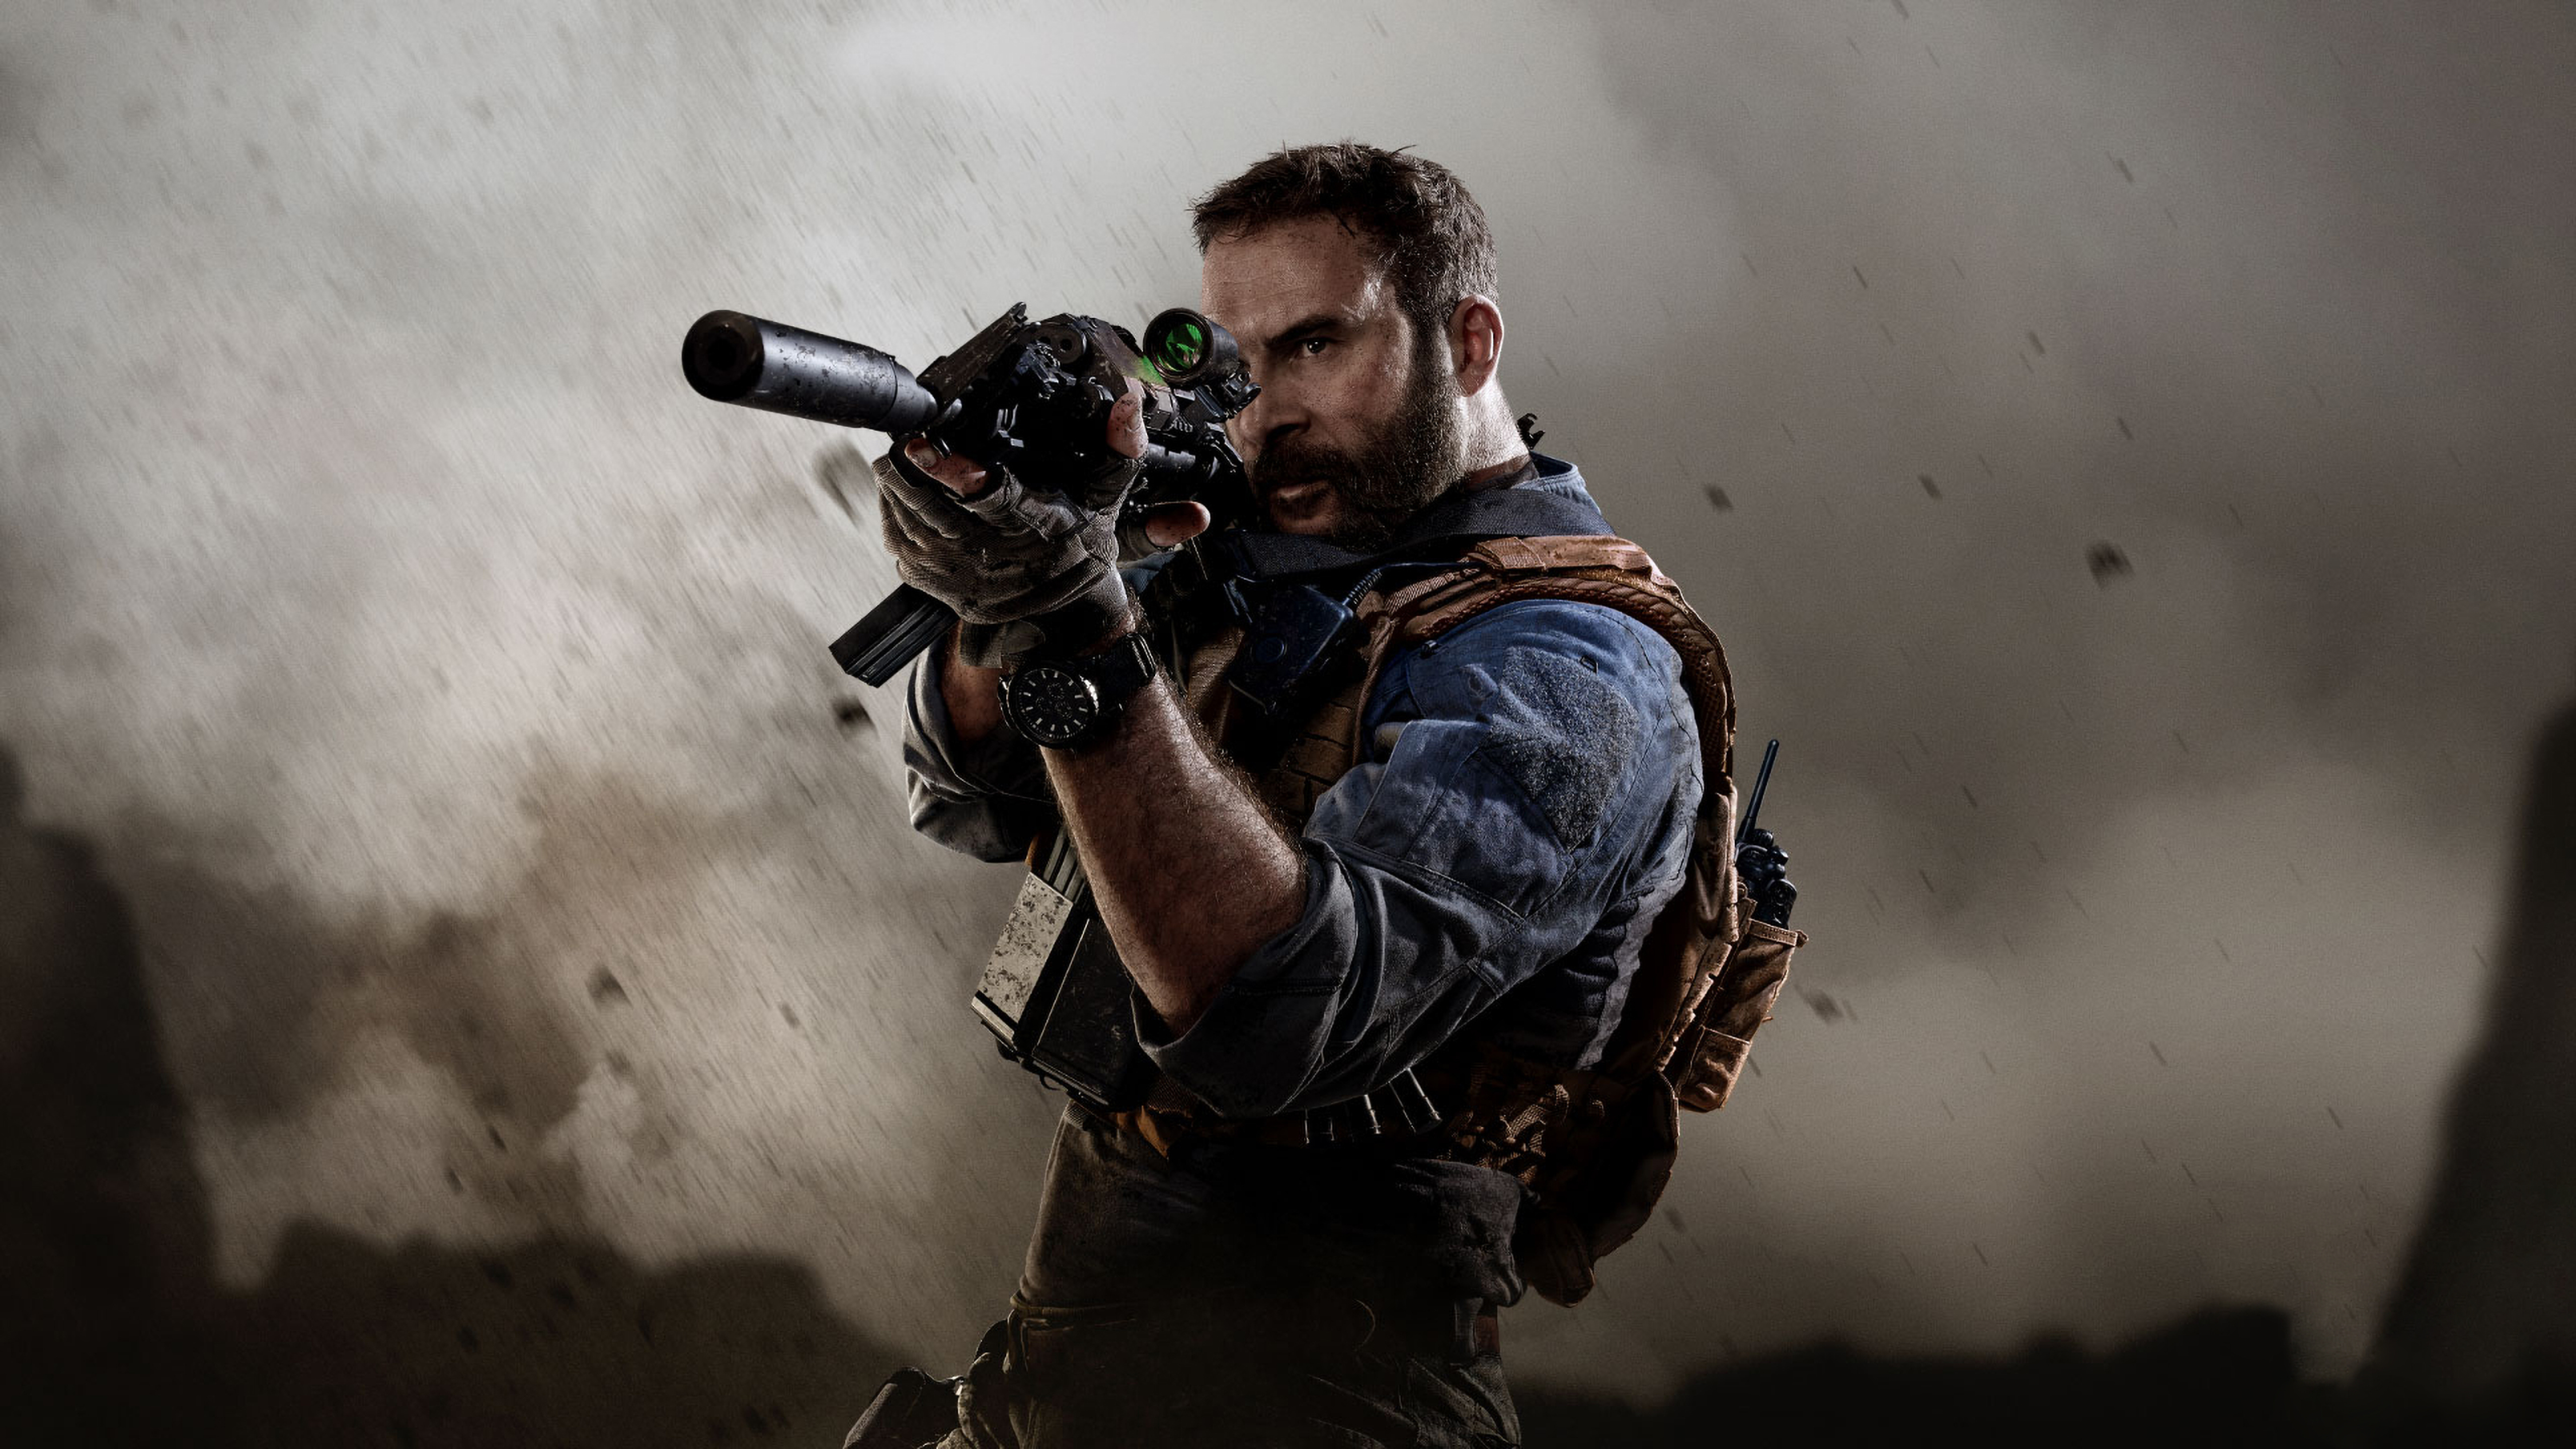 5120x2880 Call Of Duty Modern Warfare Game 5k Wallpaper Hd